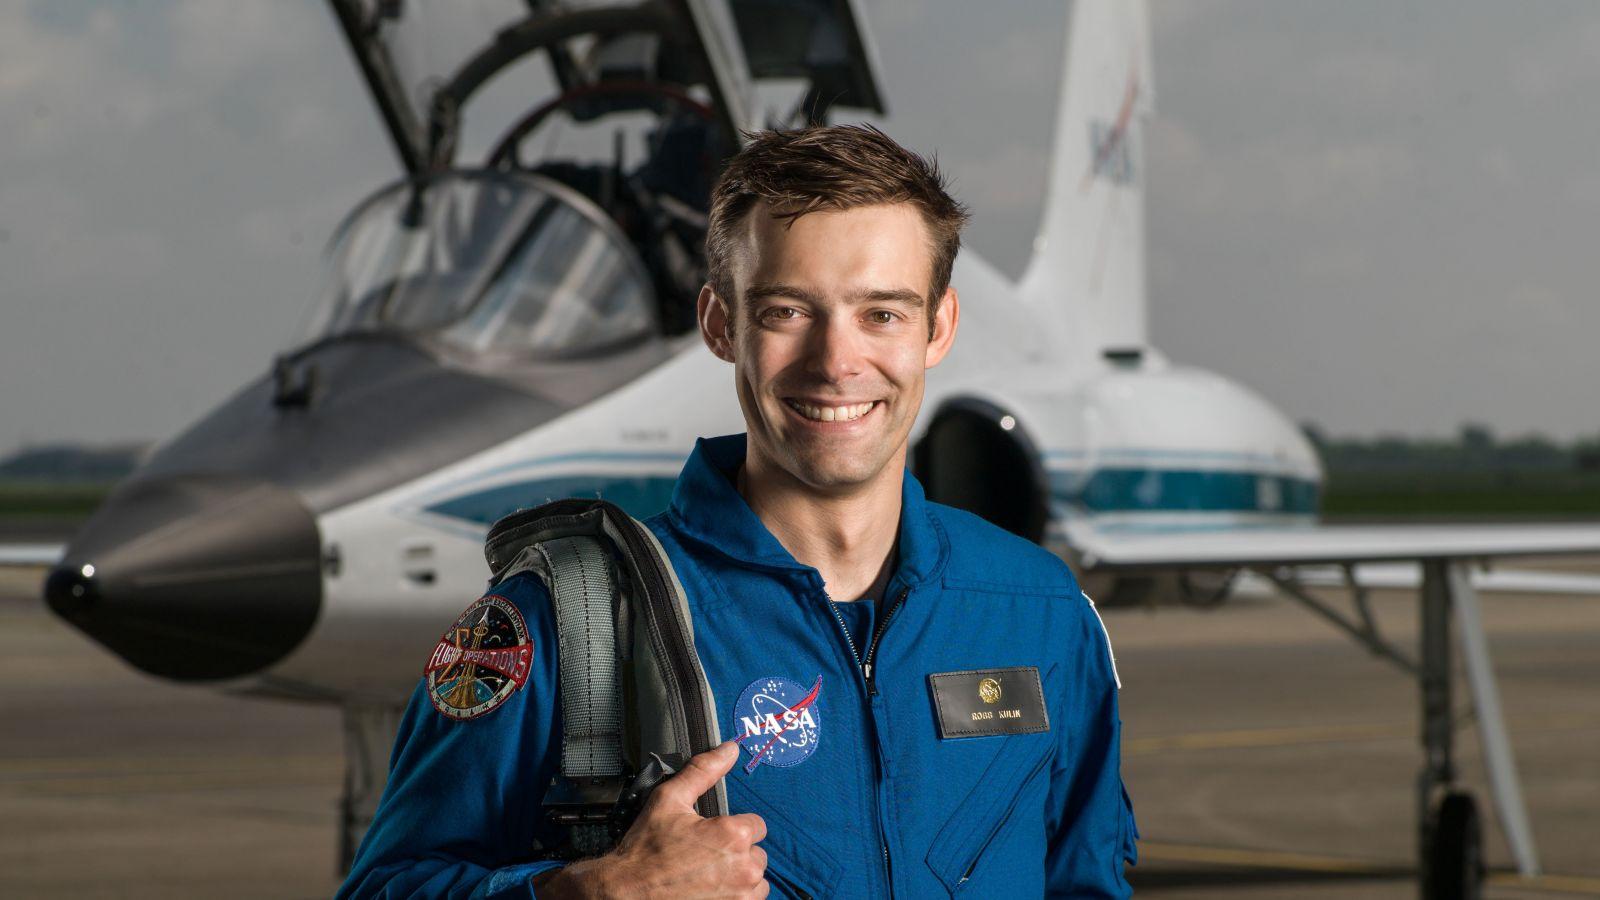 Robb Kulin. Picture credits: NASA